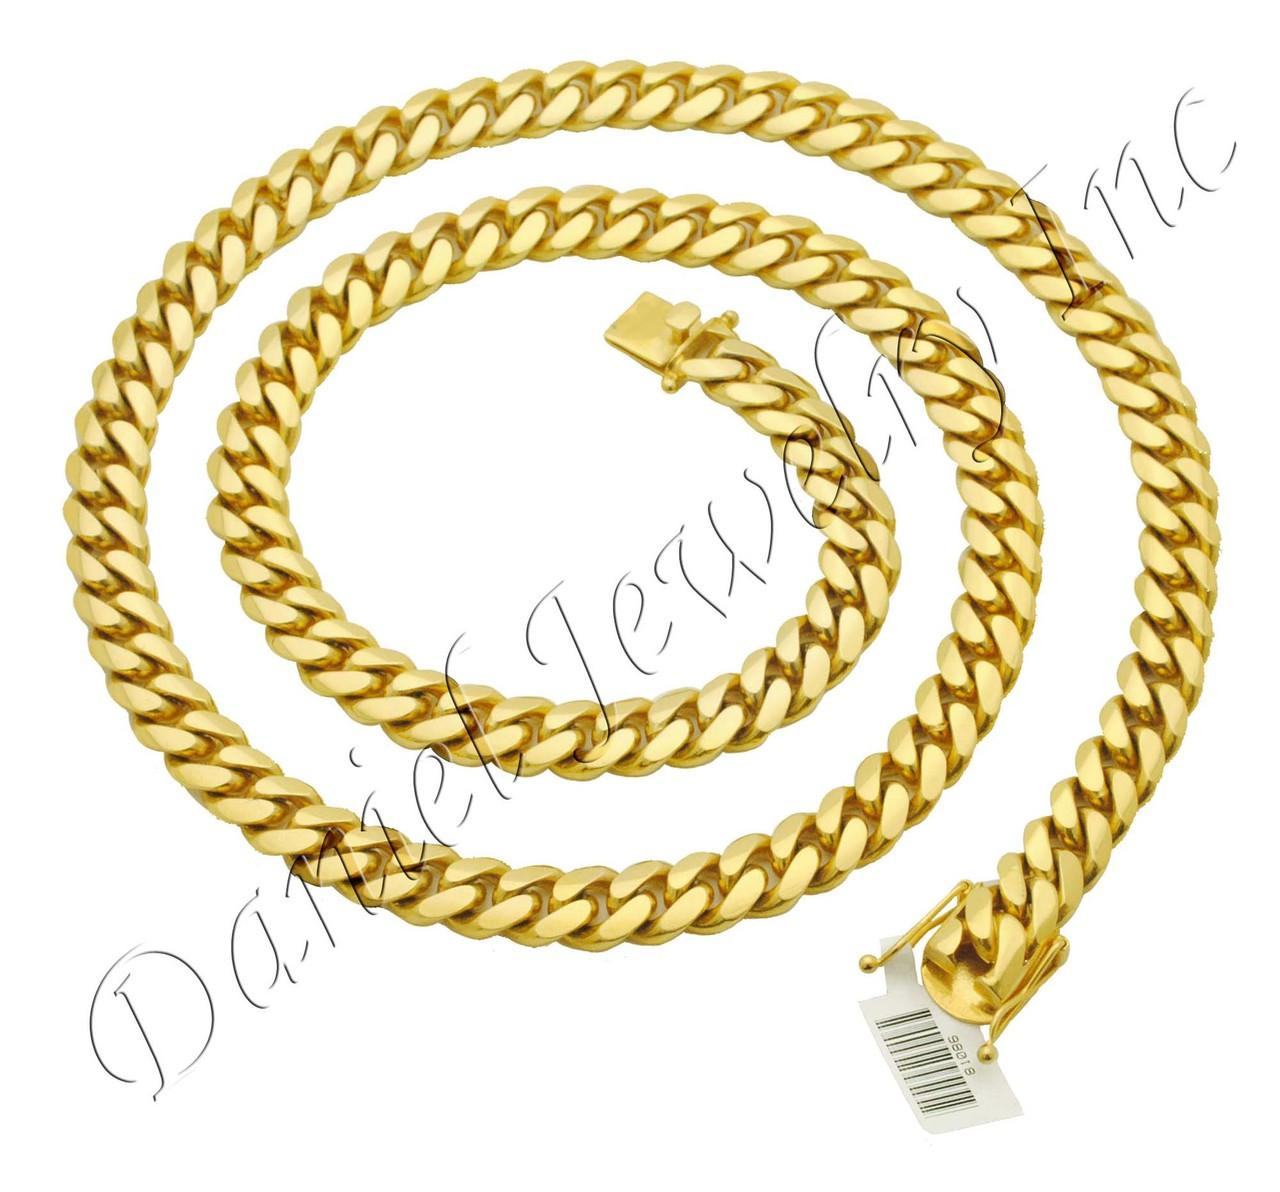 10k Gold Cuban Link Chain >> 10mm Miami Cuban Link 10k Chain